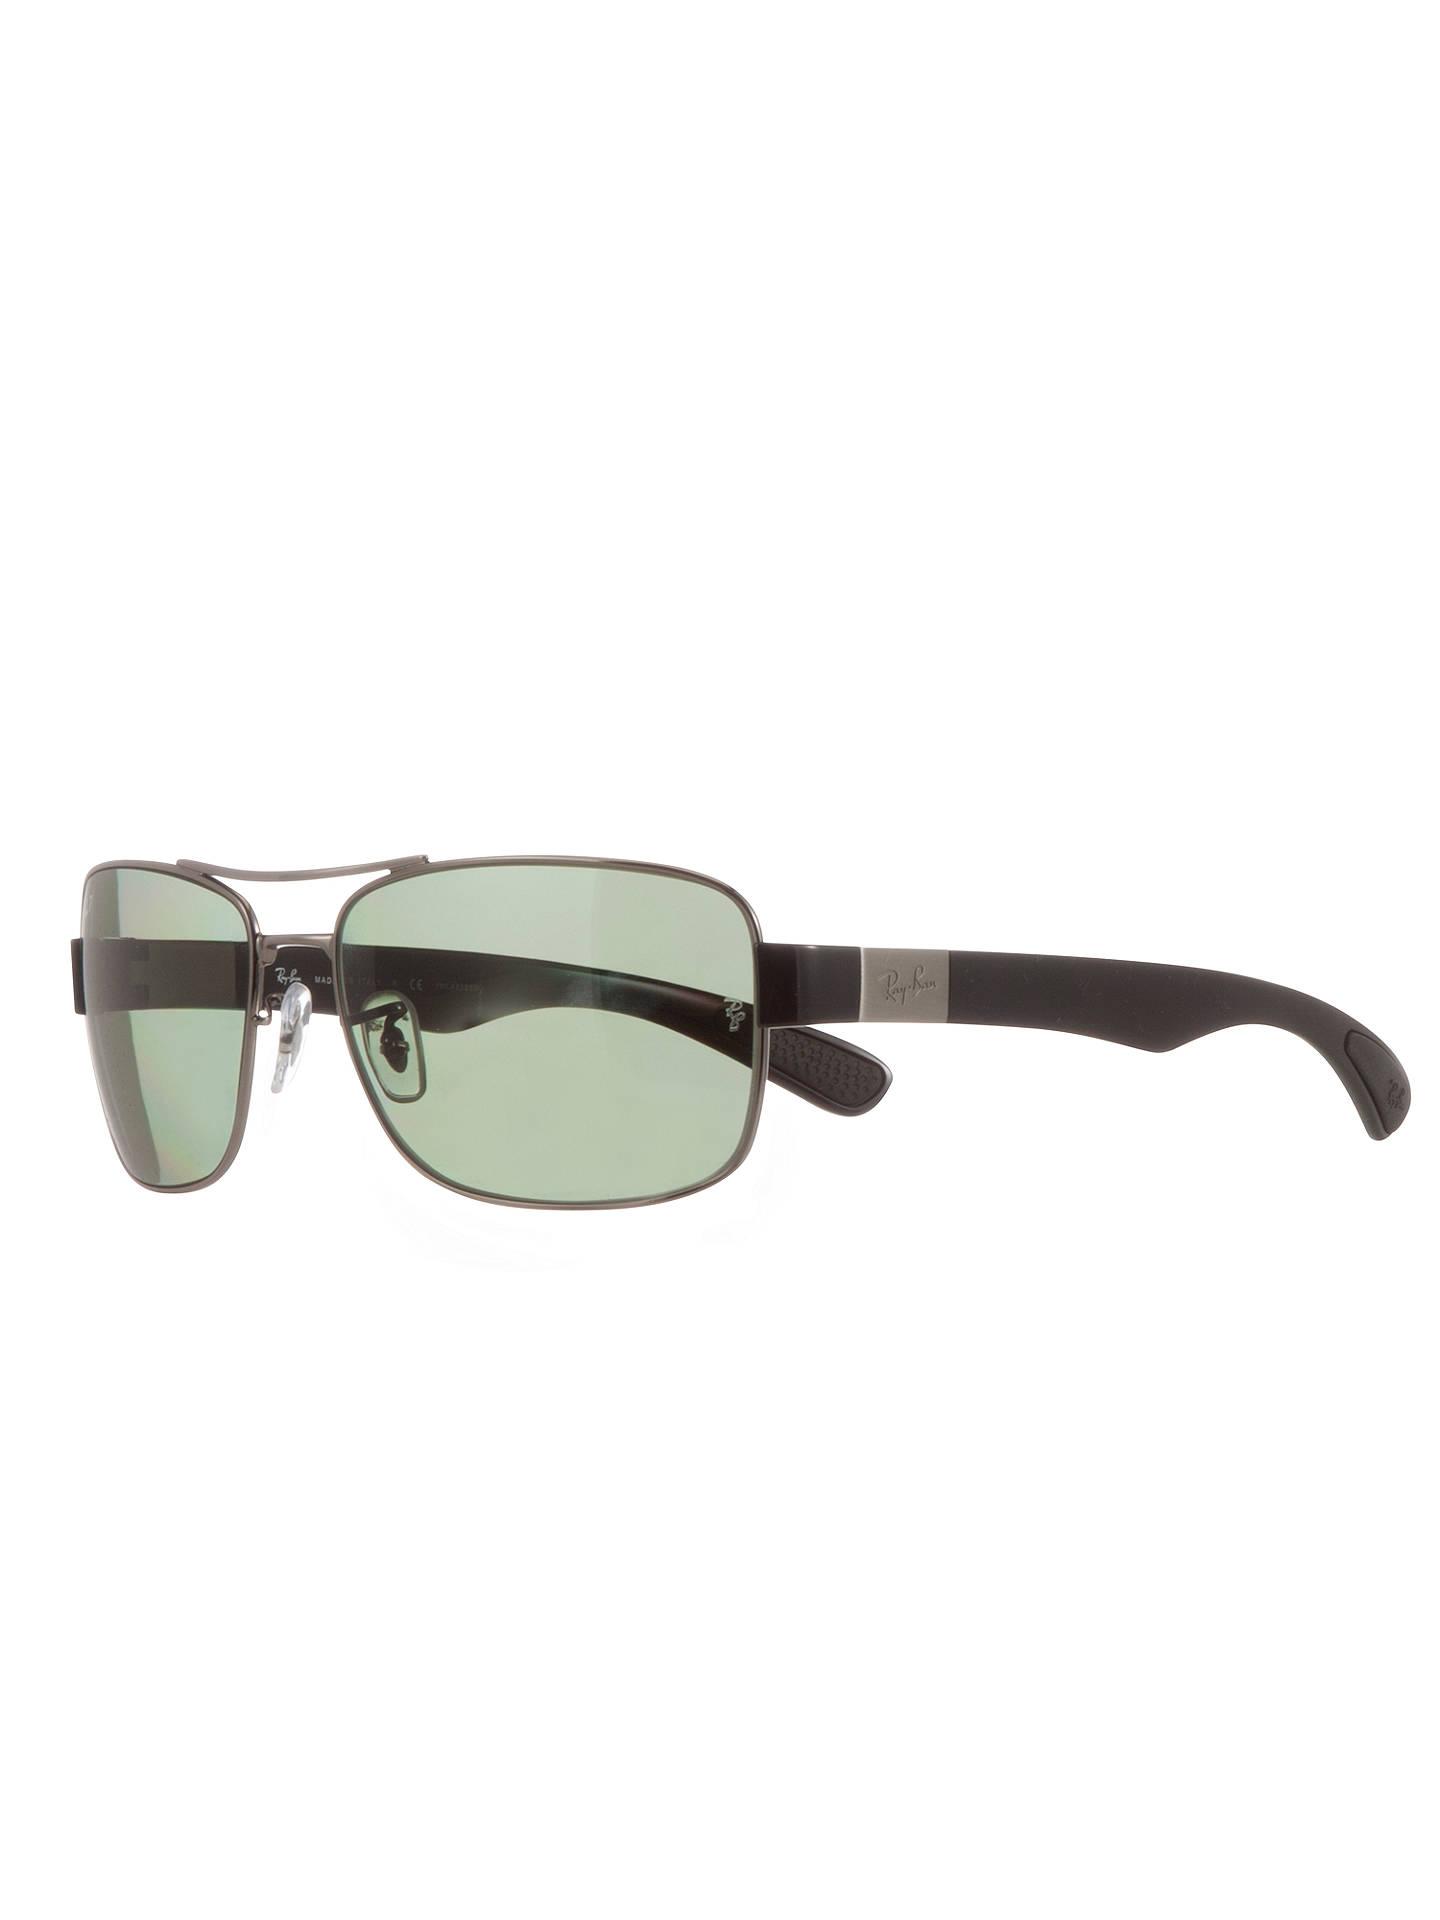 Ray-Ban RB3522 Square Framed Polarised Sunglasses, Green/Black at ...